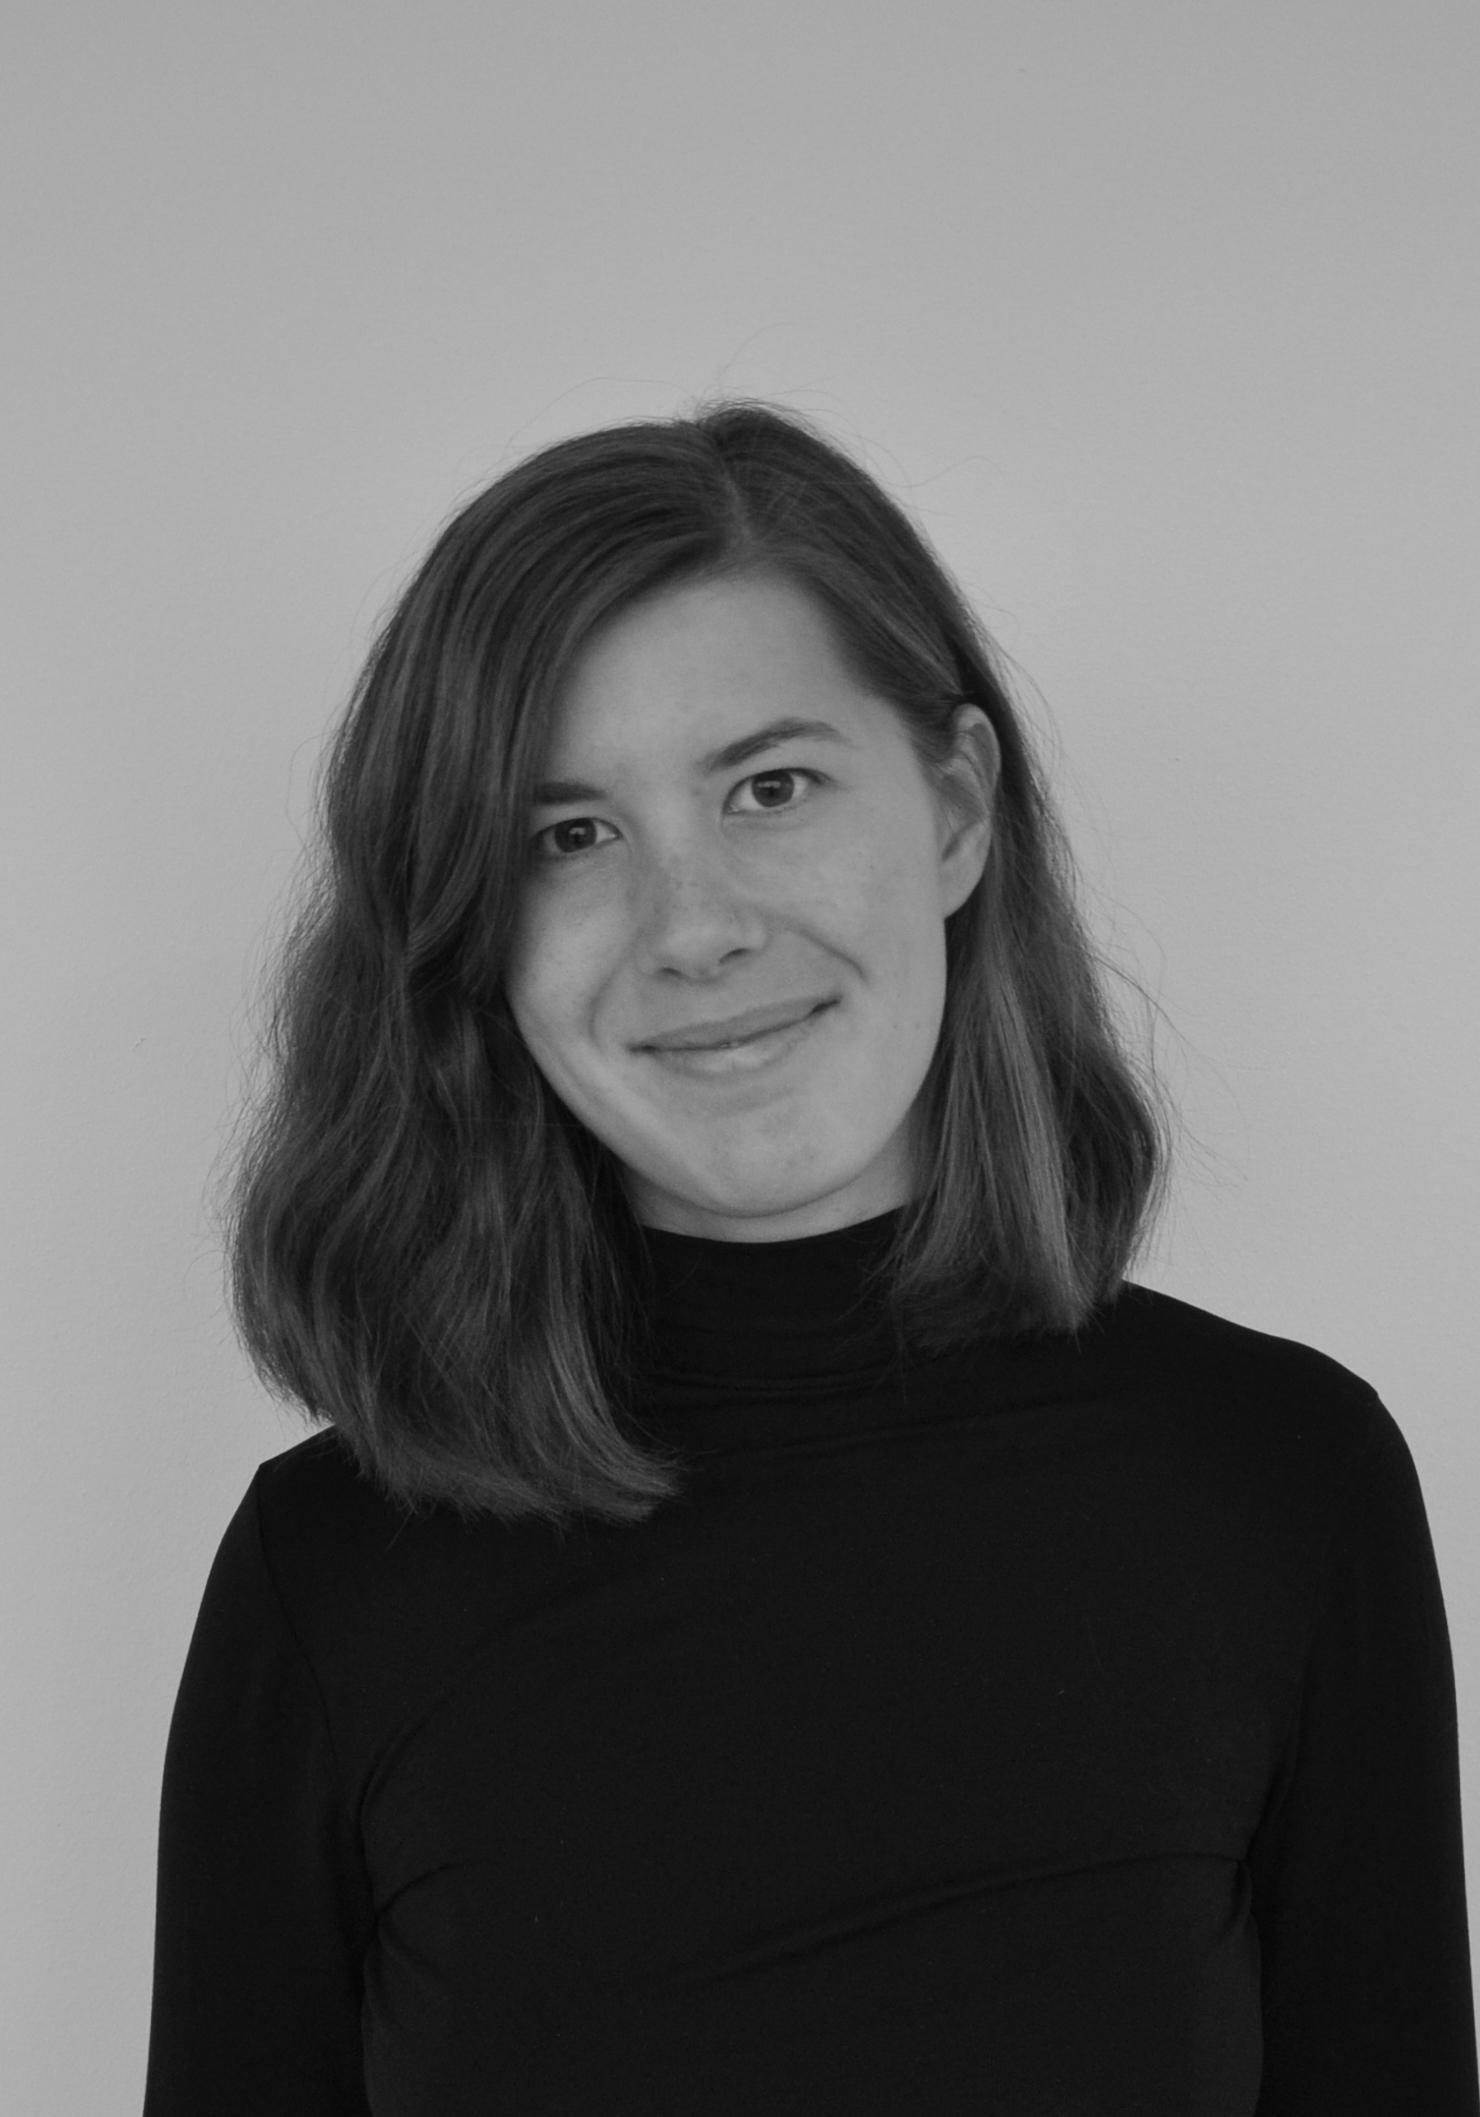 Elin Ohlsson Tornberg